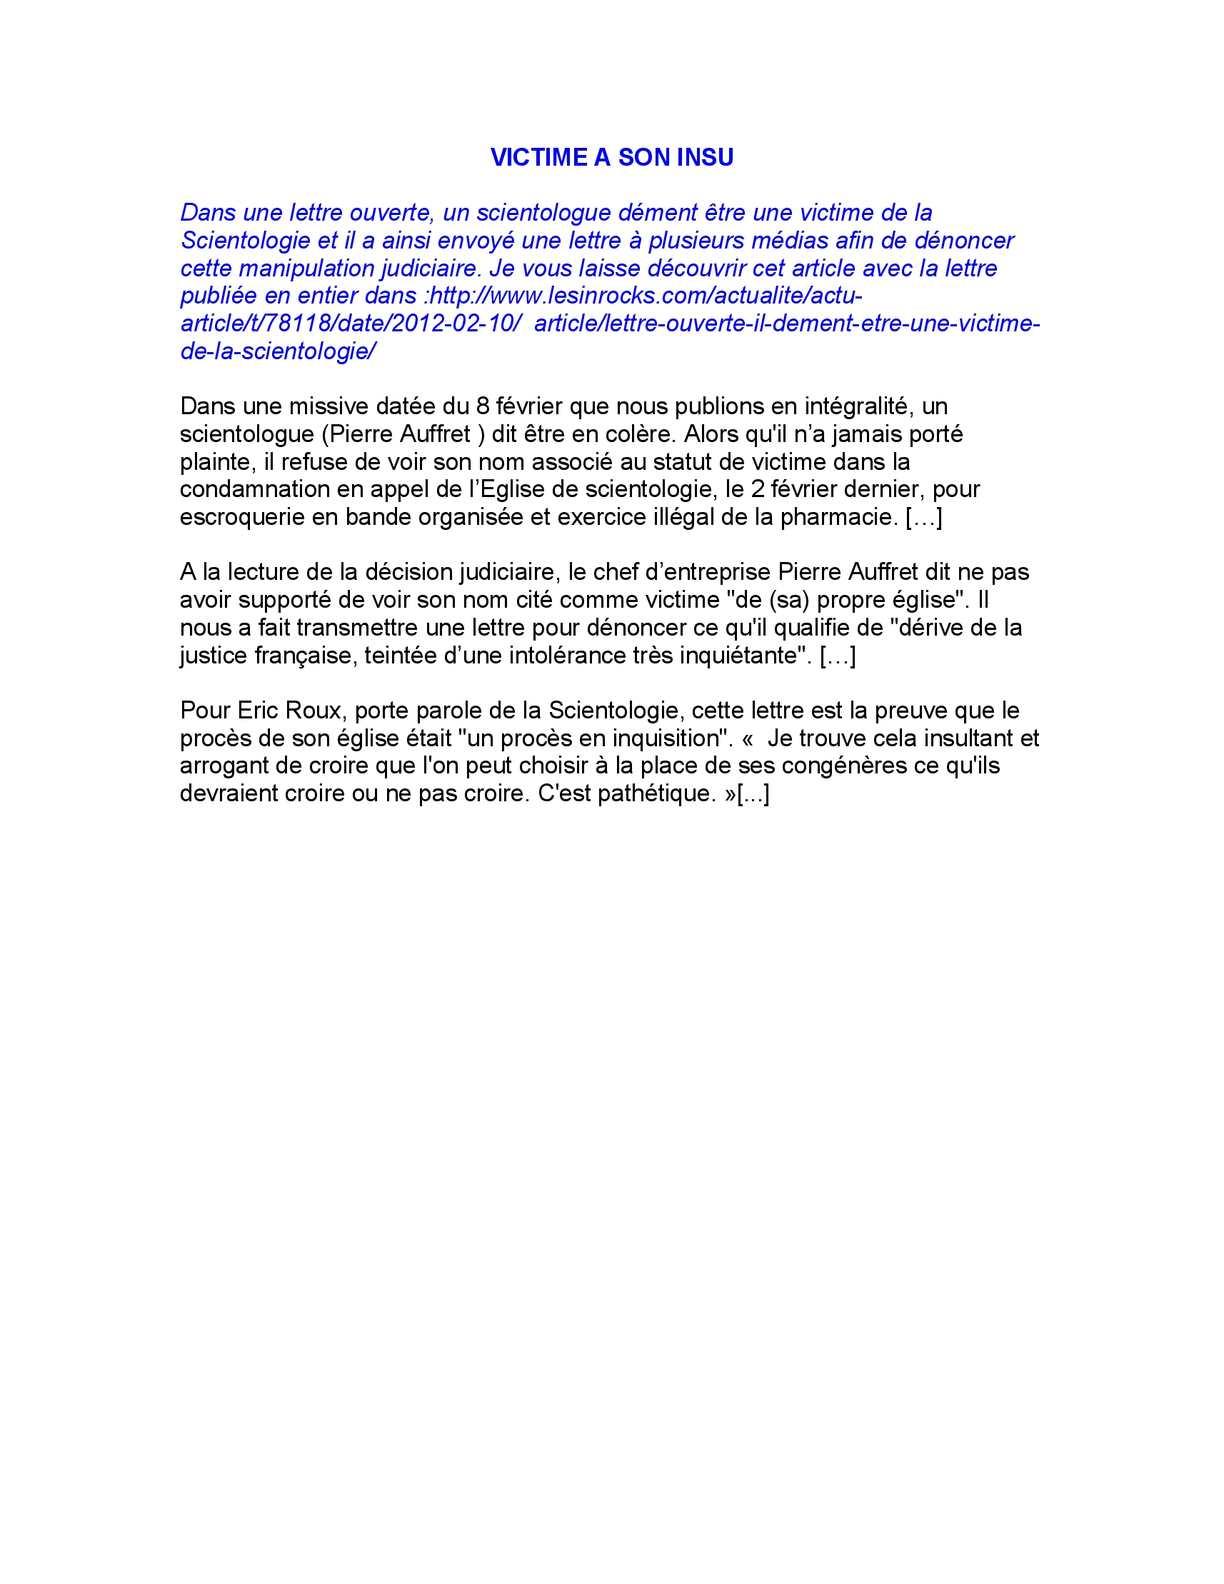 Jul Bande Organisee Parole : bande, organisee, parole, Calaméo, VICTIME